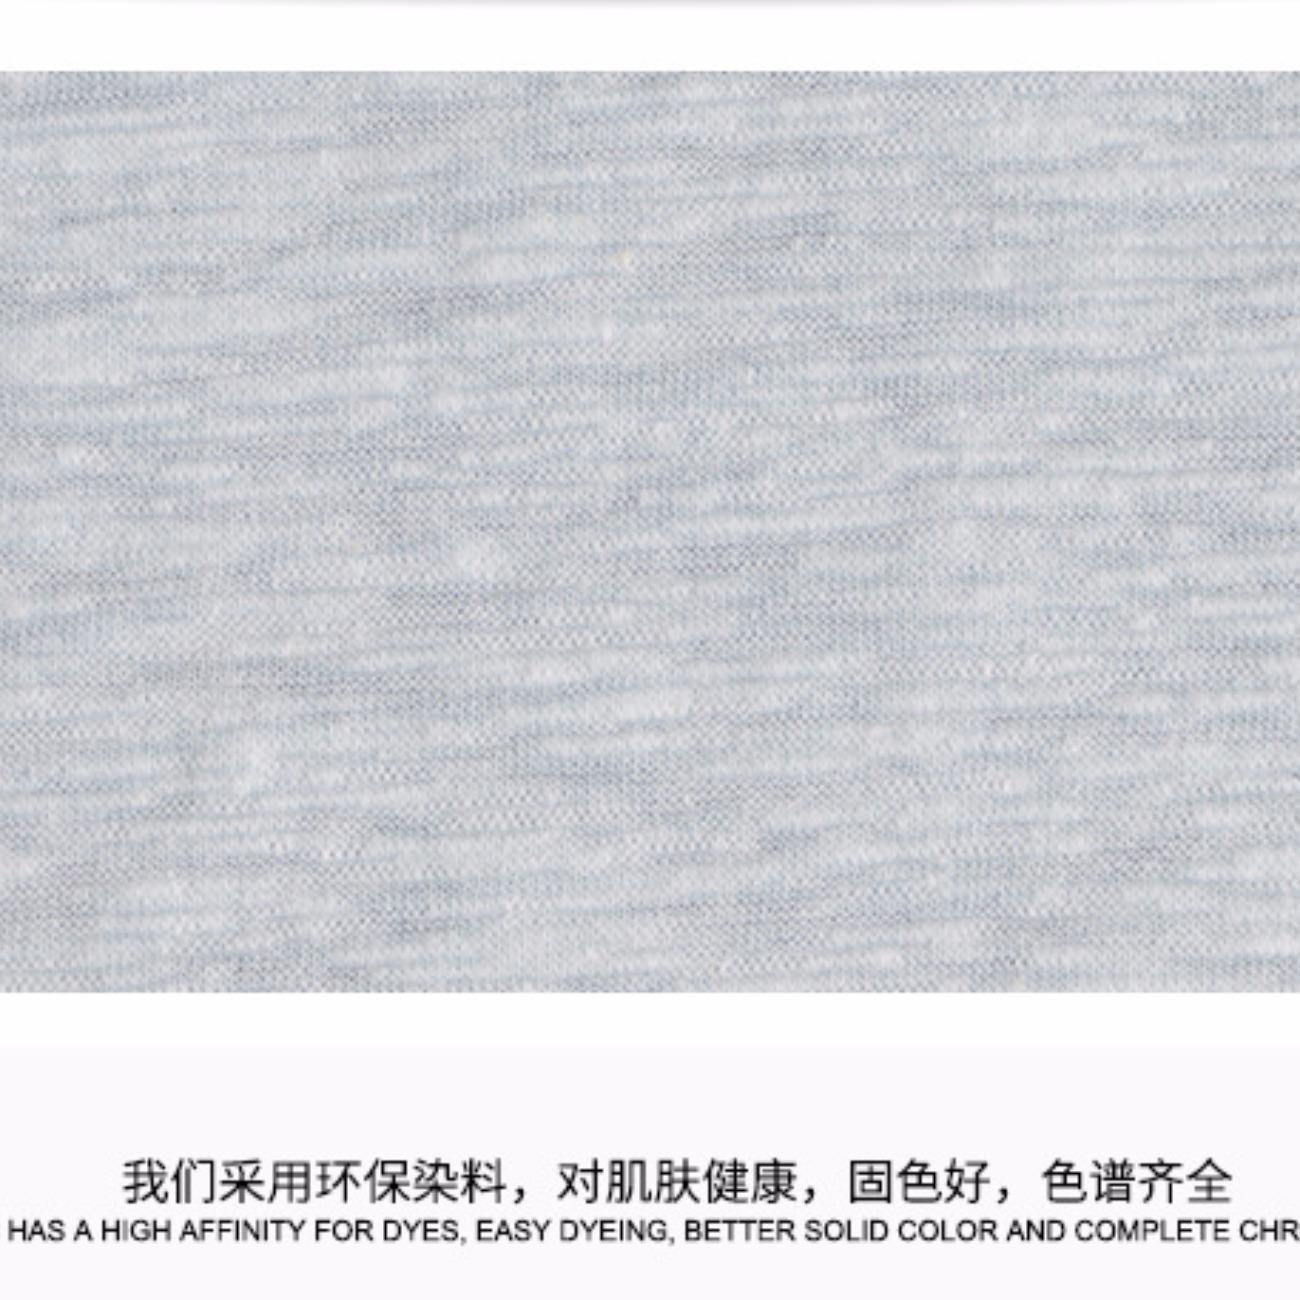 220g雪花竹节面料 秋冬时尚打底衫卫衣面料 弹力涤纶布料 现货